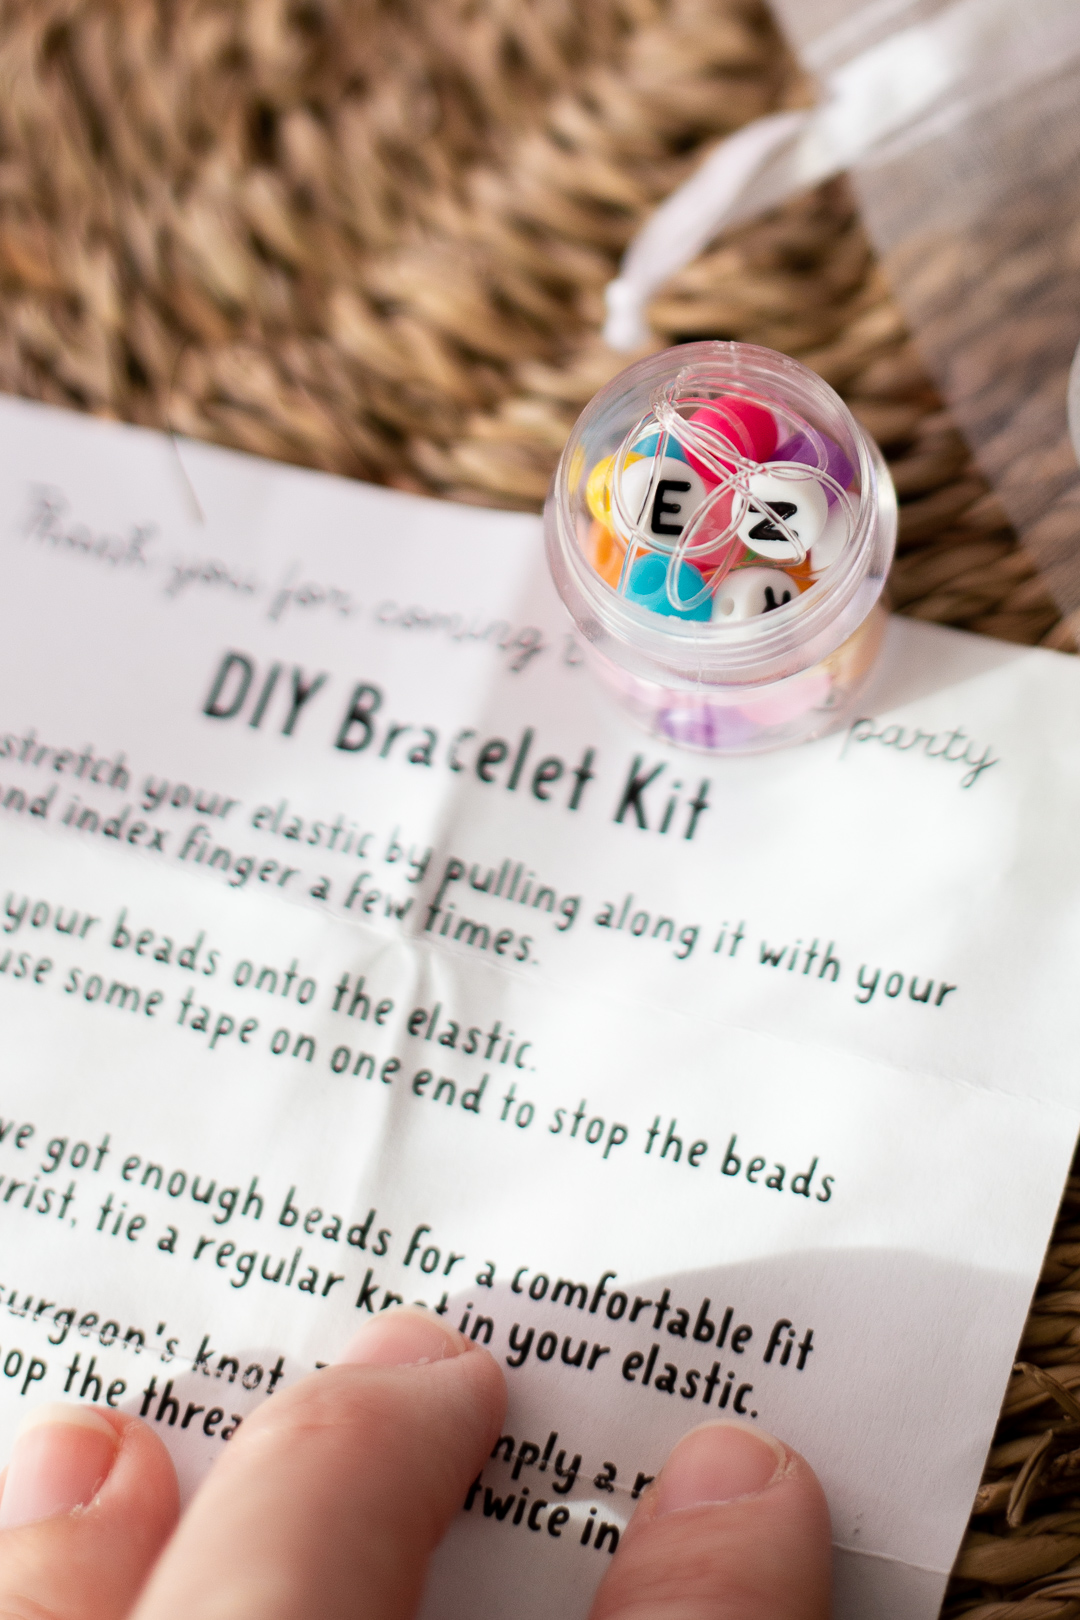 Rainbow Party - Party Favour Idea - DIY stretchy bracelet kit